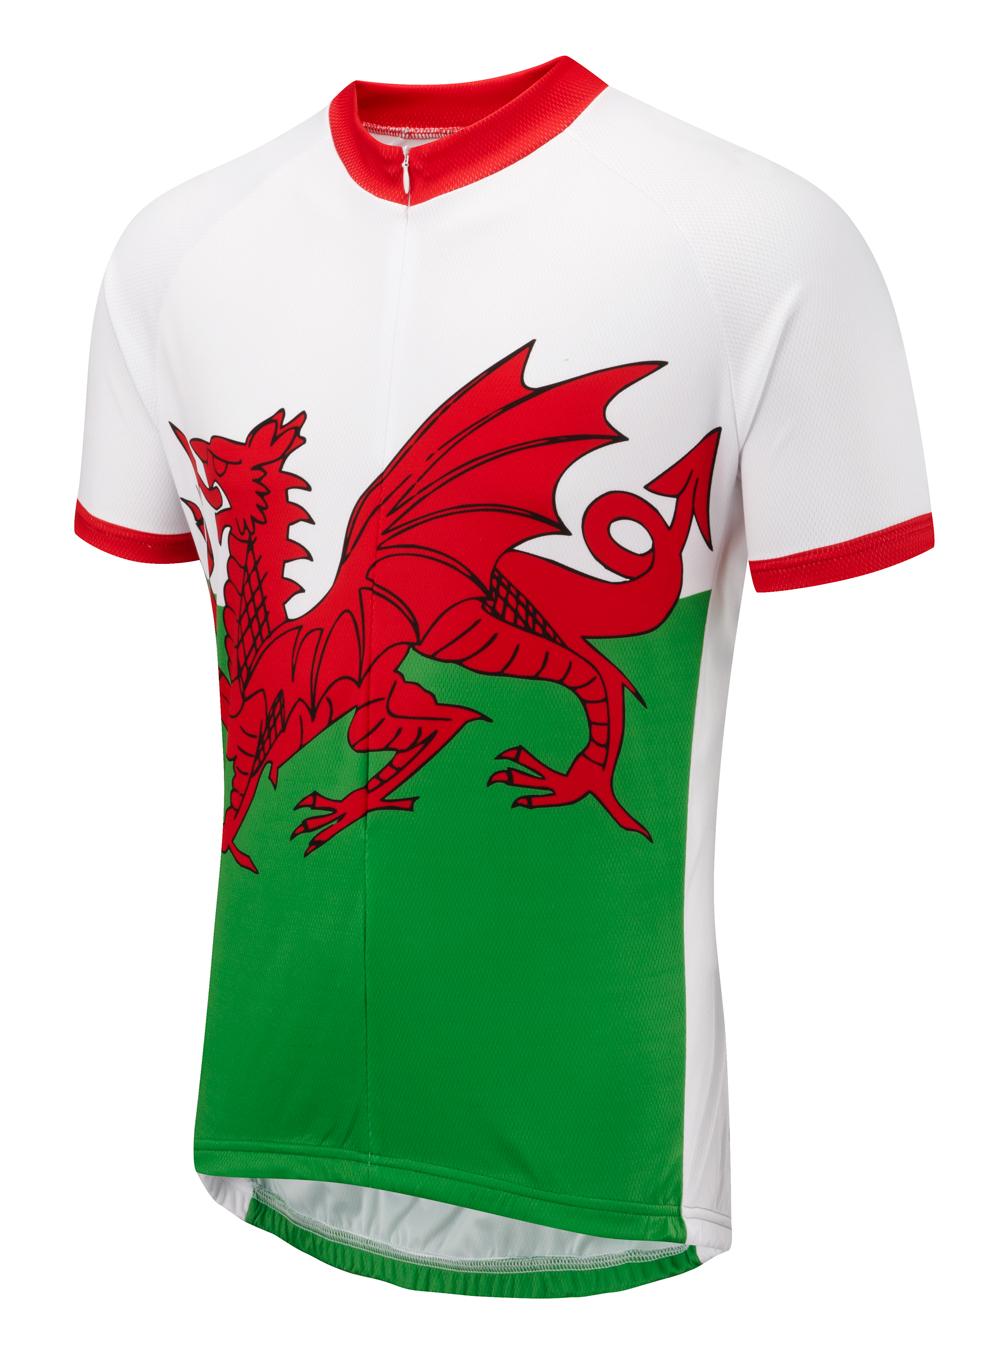 WALES V2 Short Sleeve Cycling Jersey